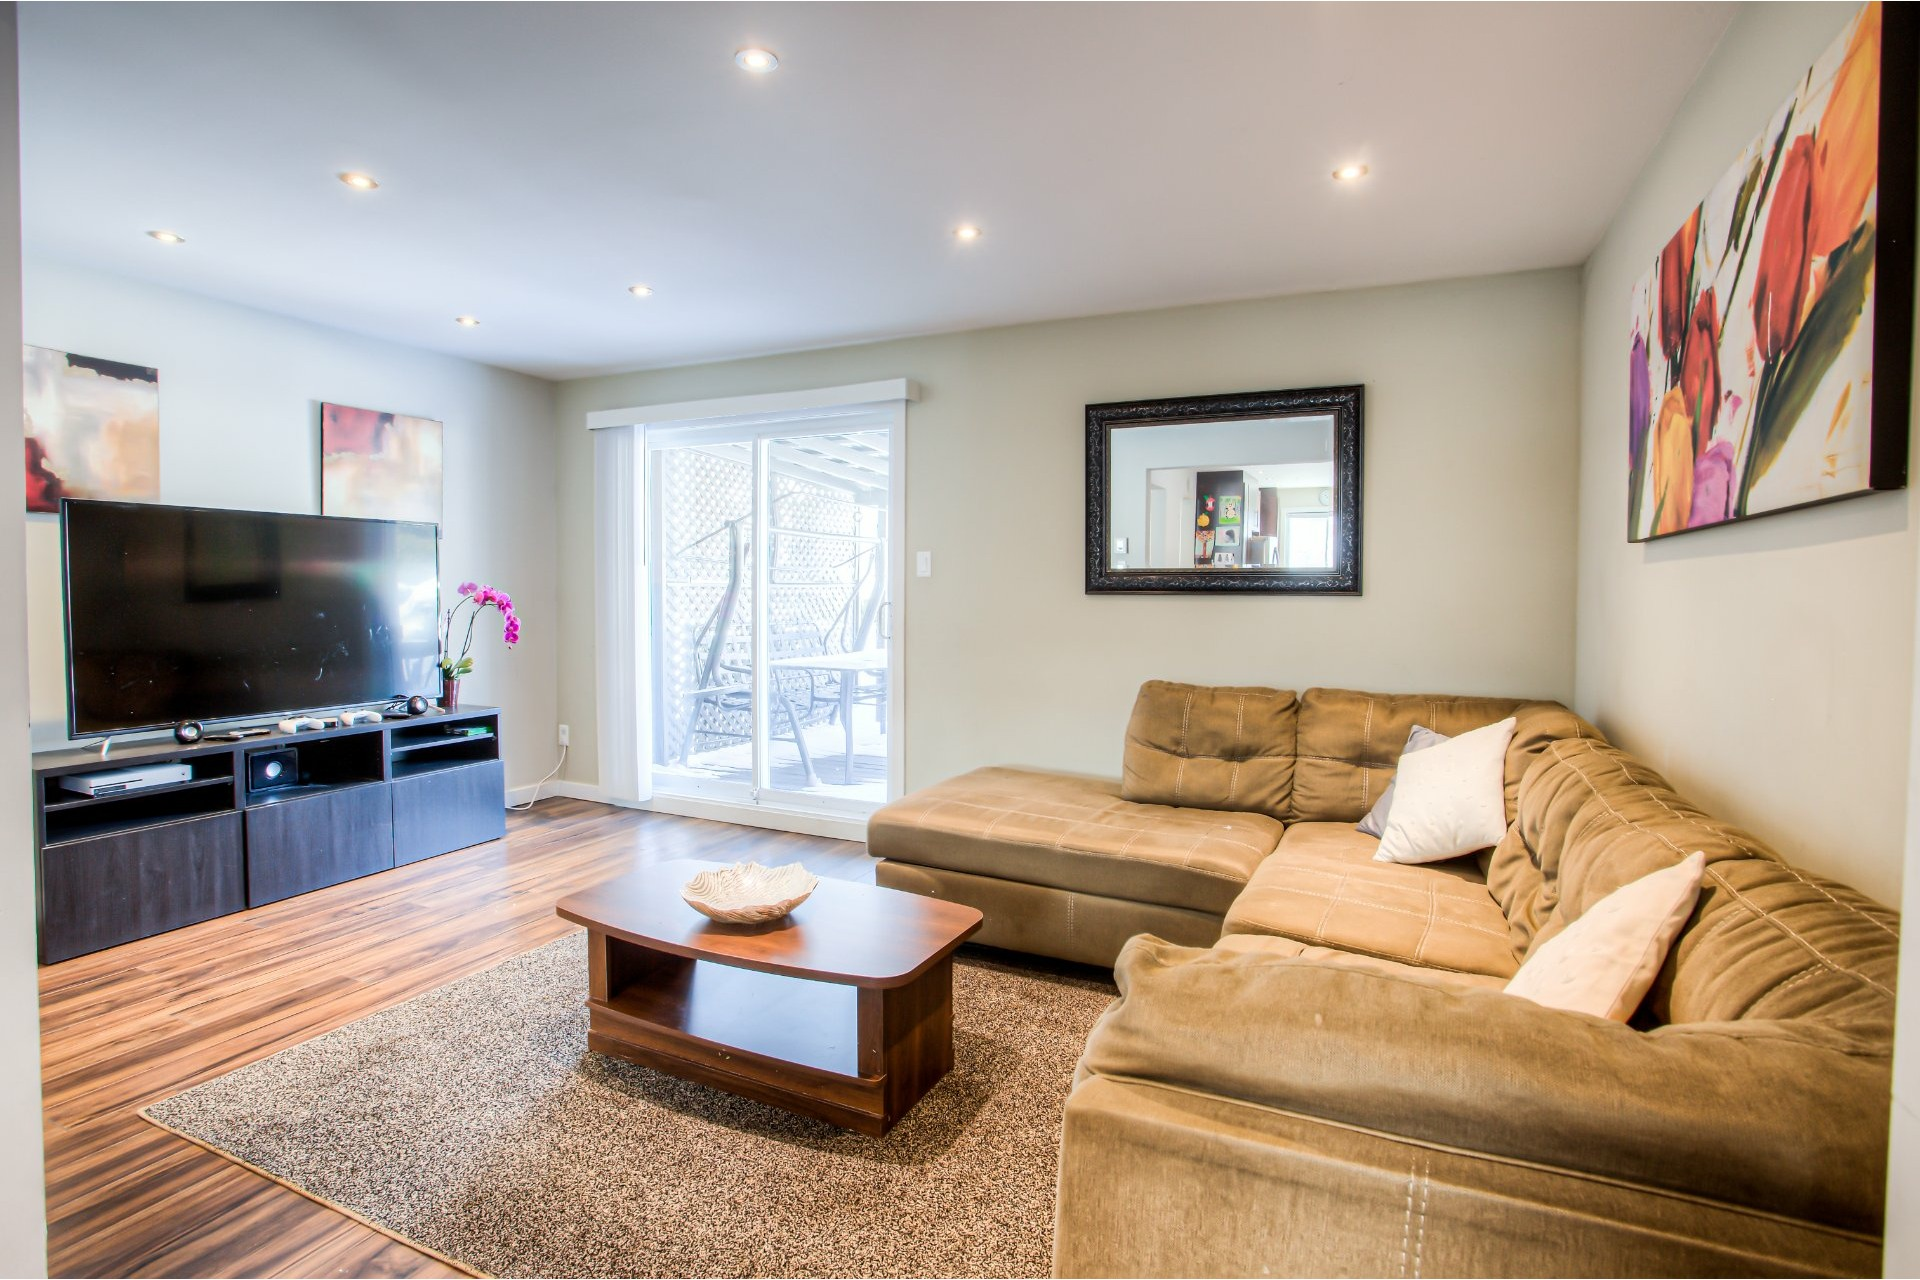 image 5 - House For rent Pierrefonds-Roxboro Montréal  - 9 rooms